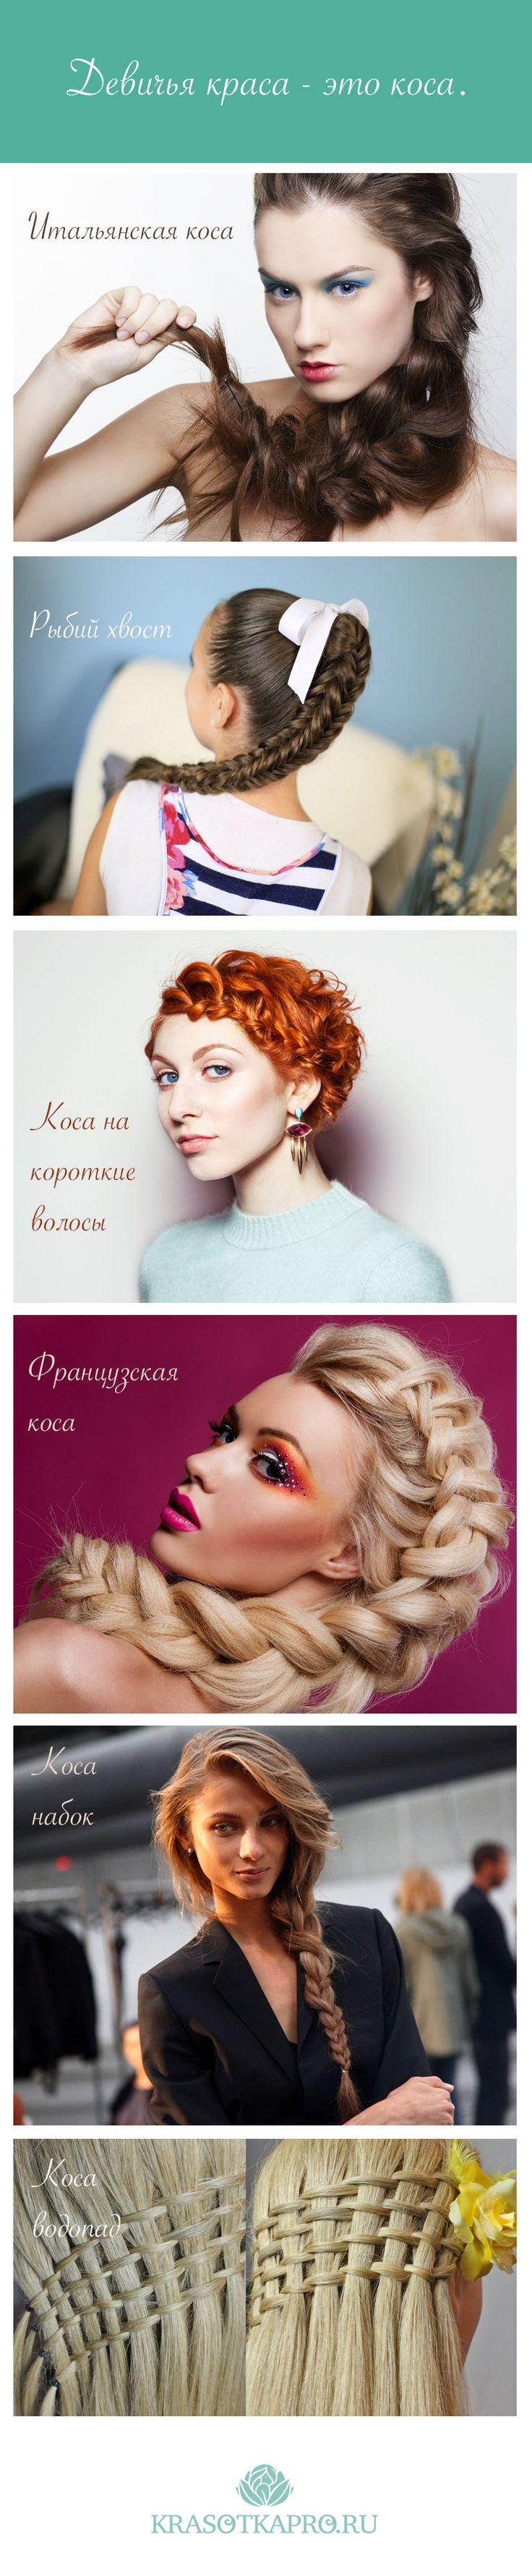 Девичья краса - это коса. by KrasotkaPro #КрасоткаПро #KrasotkaPro #Коса #Уходзаволосами #Французскаякоса #Итальянскаякоса #Косанабок #Волосы #Haircare #Hair #Frenchbraid